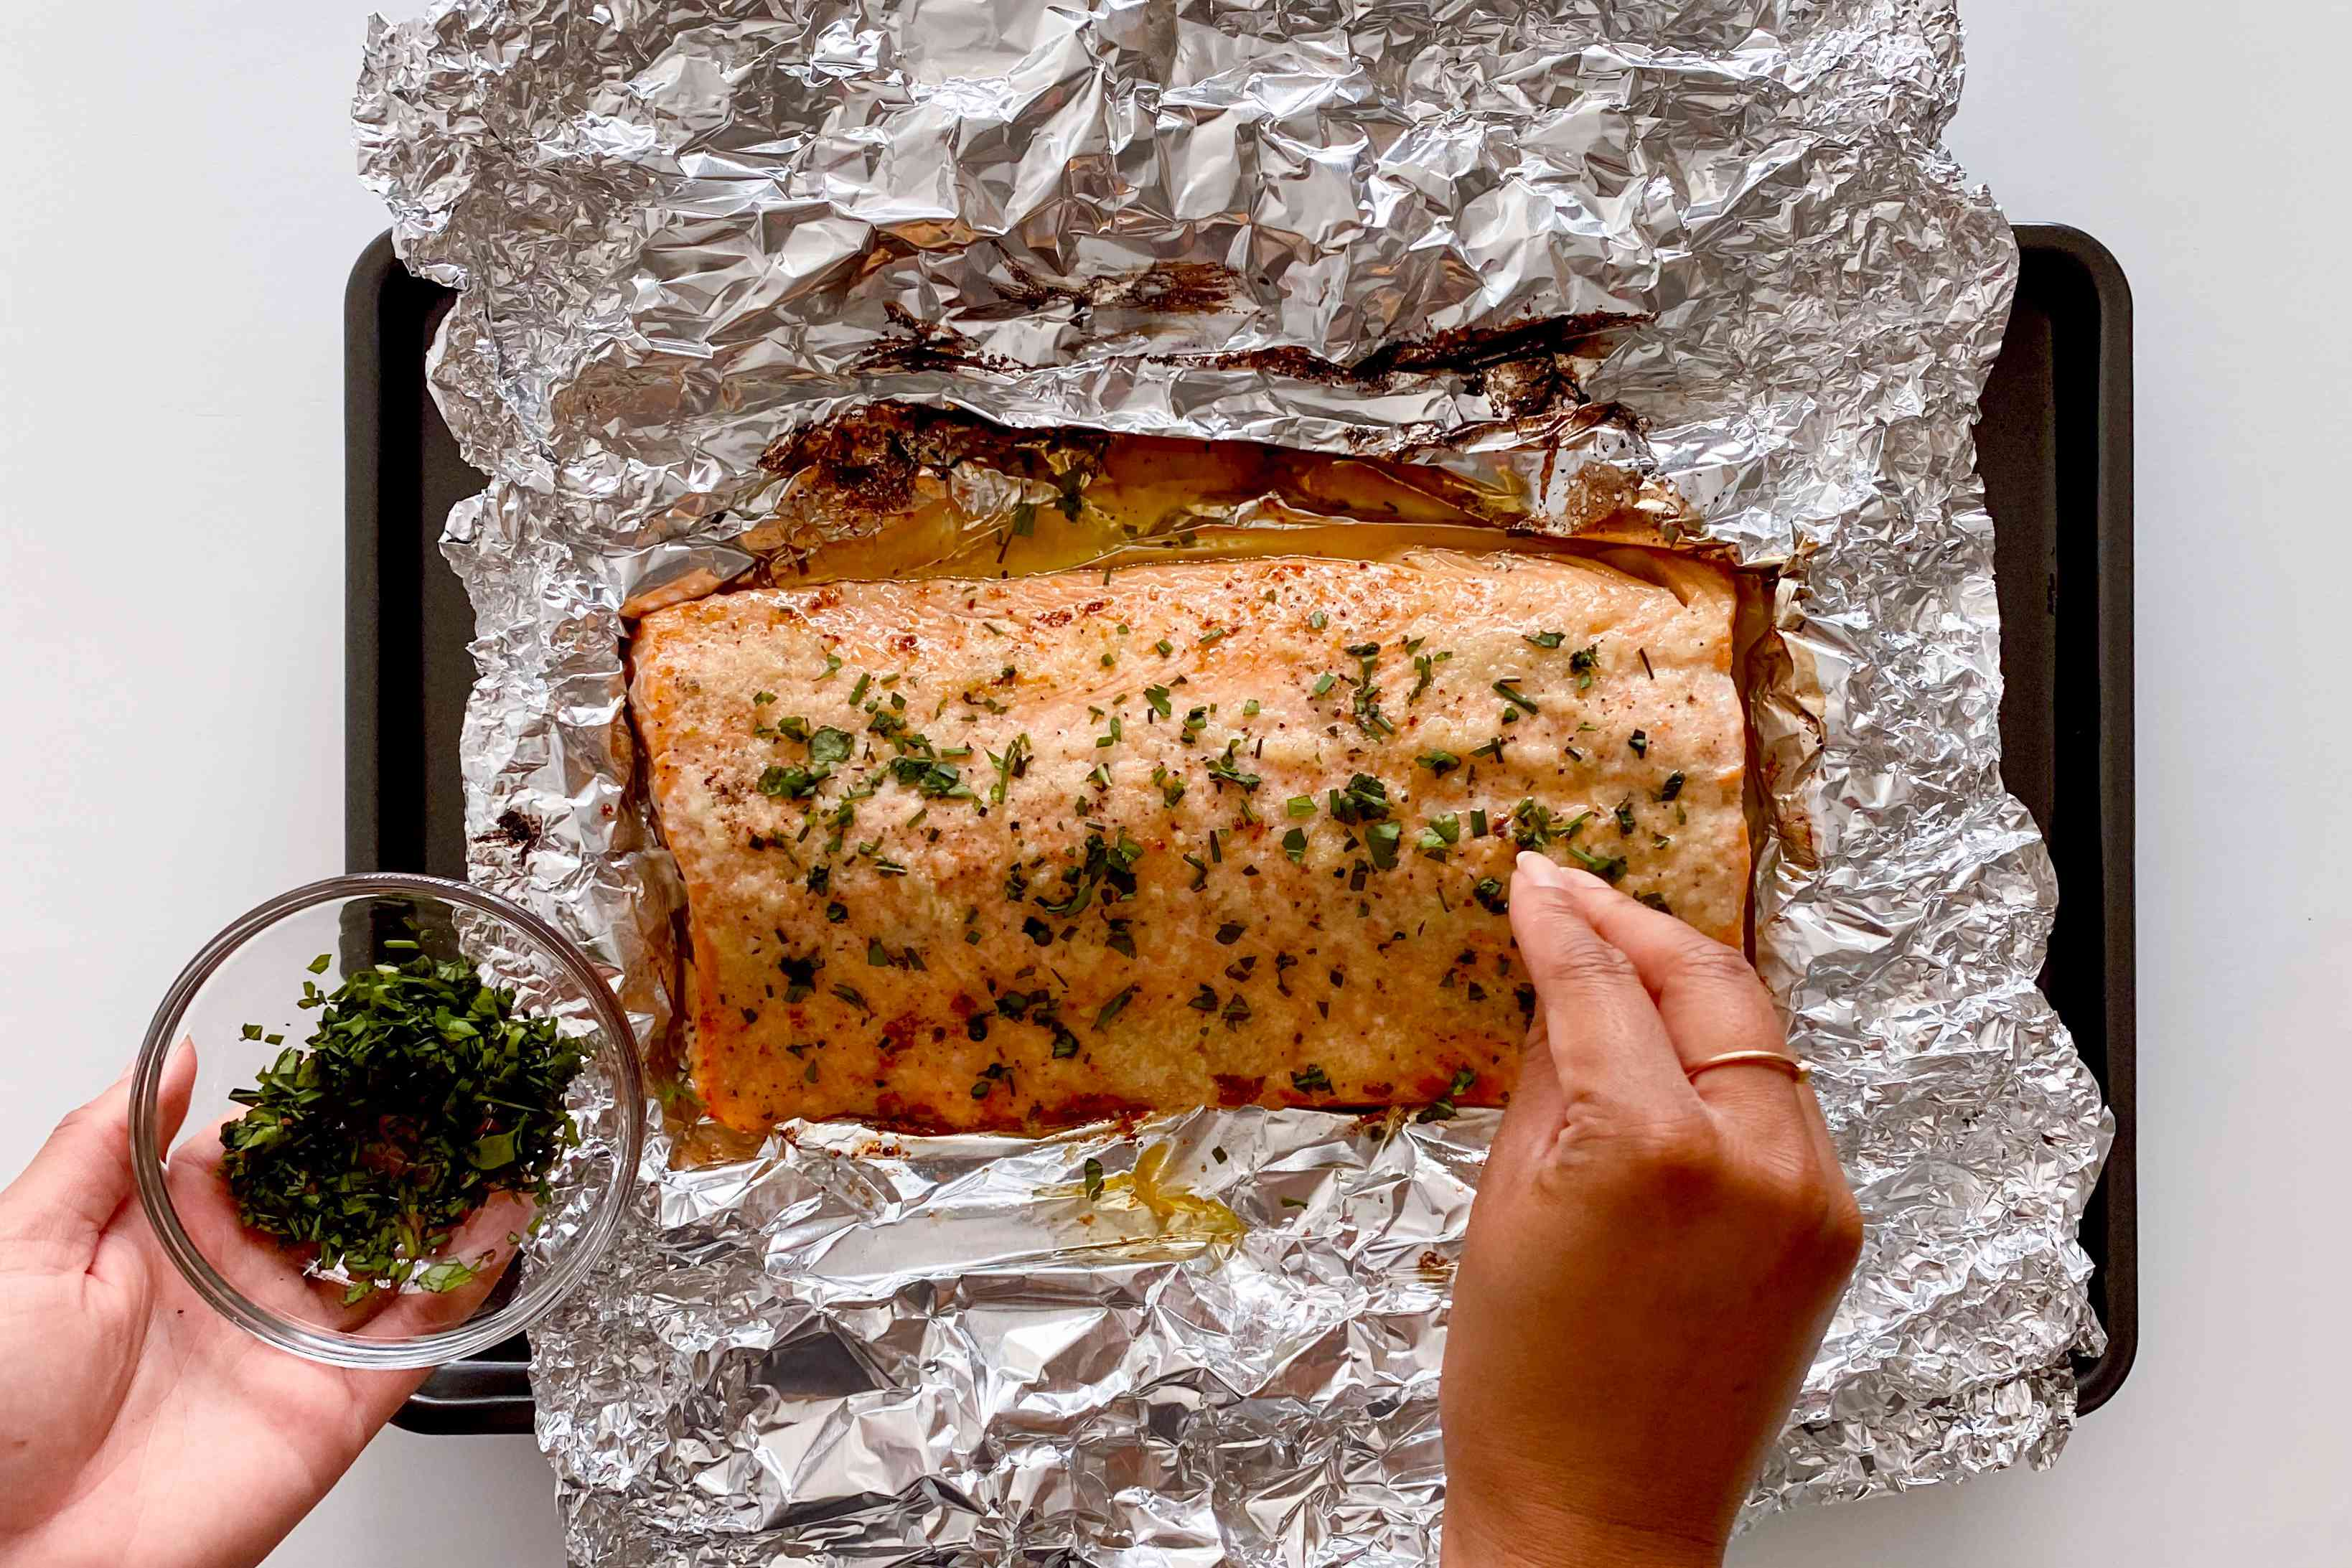 Sprinkling herbs on Honey Garlic Butter Roasted Salmon.